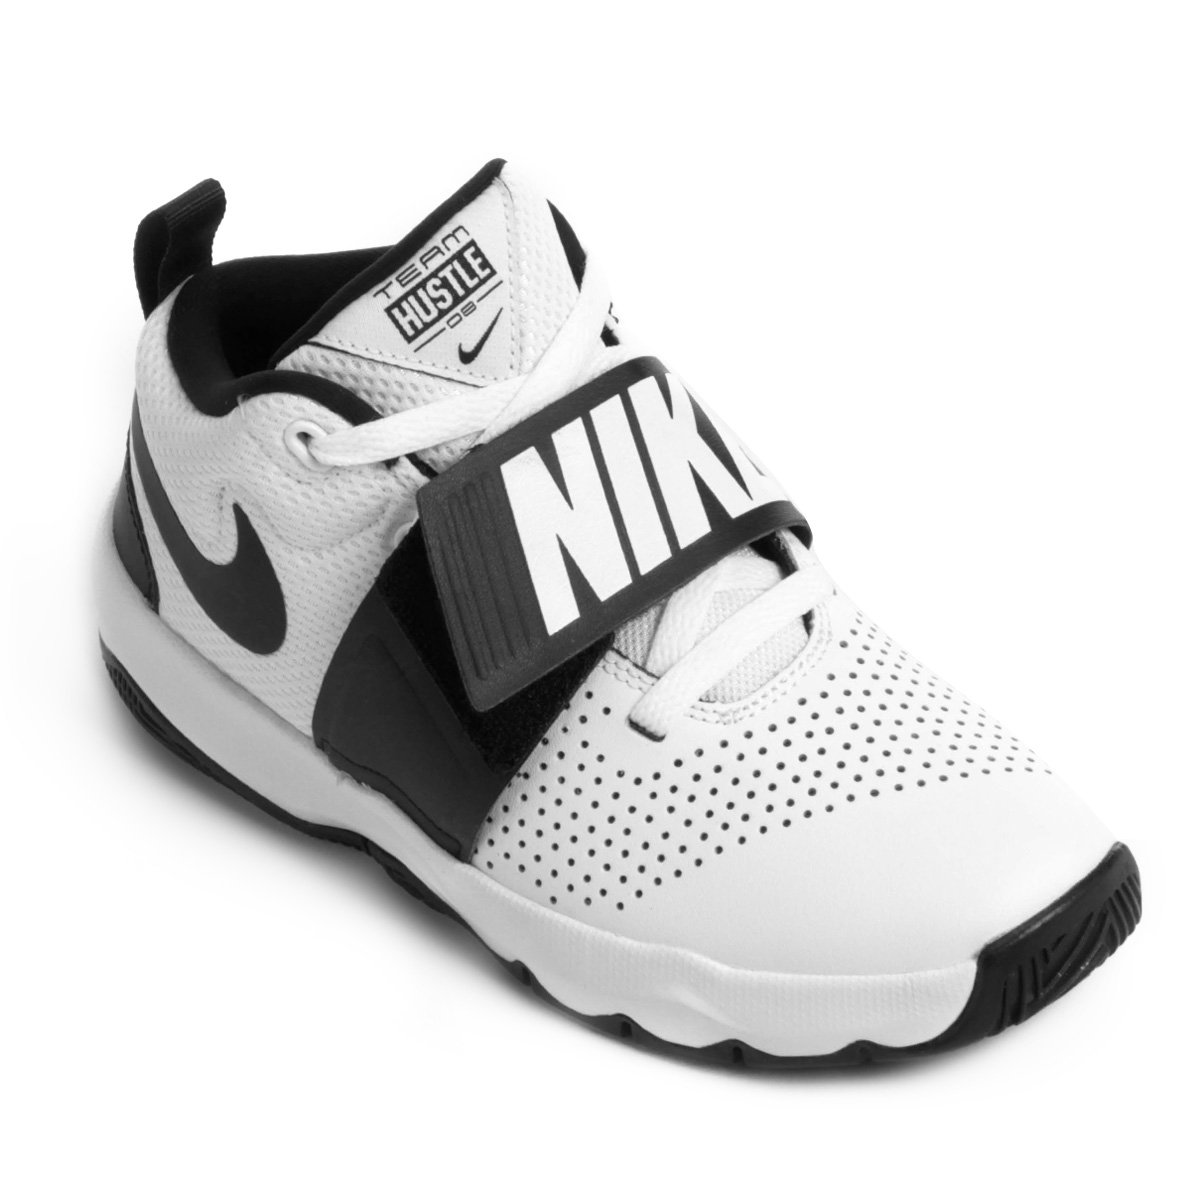 e7b78c0df89 Tênis Infantil Nike Team Hustle D8 Masculino